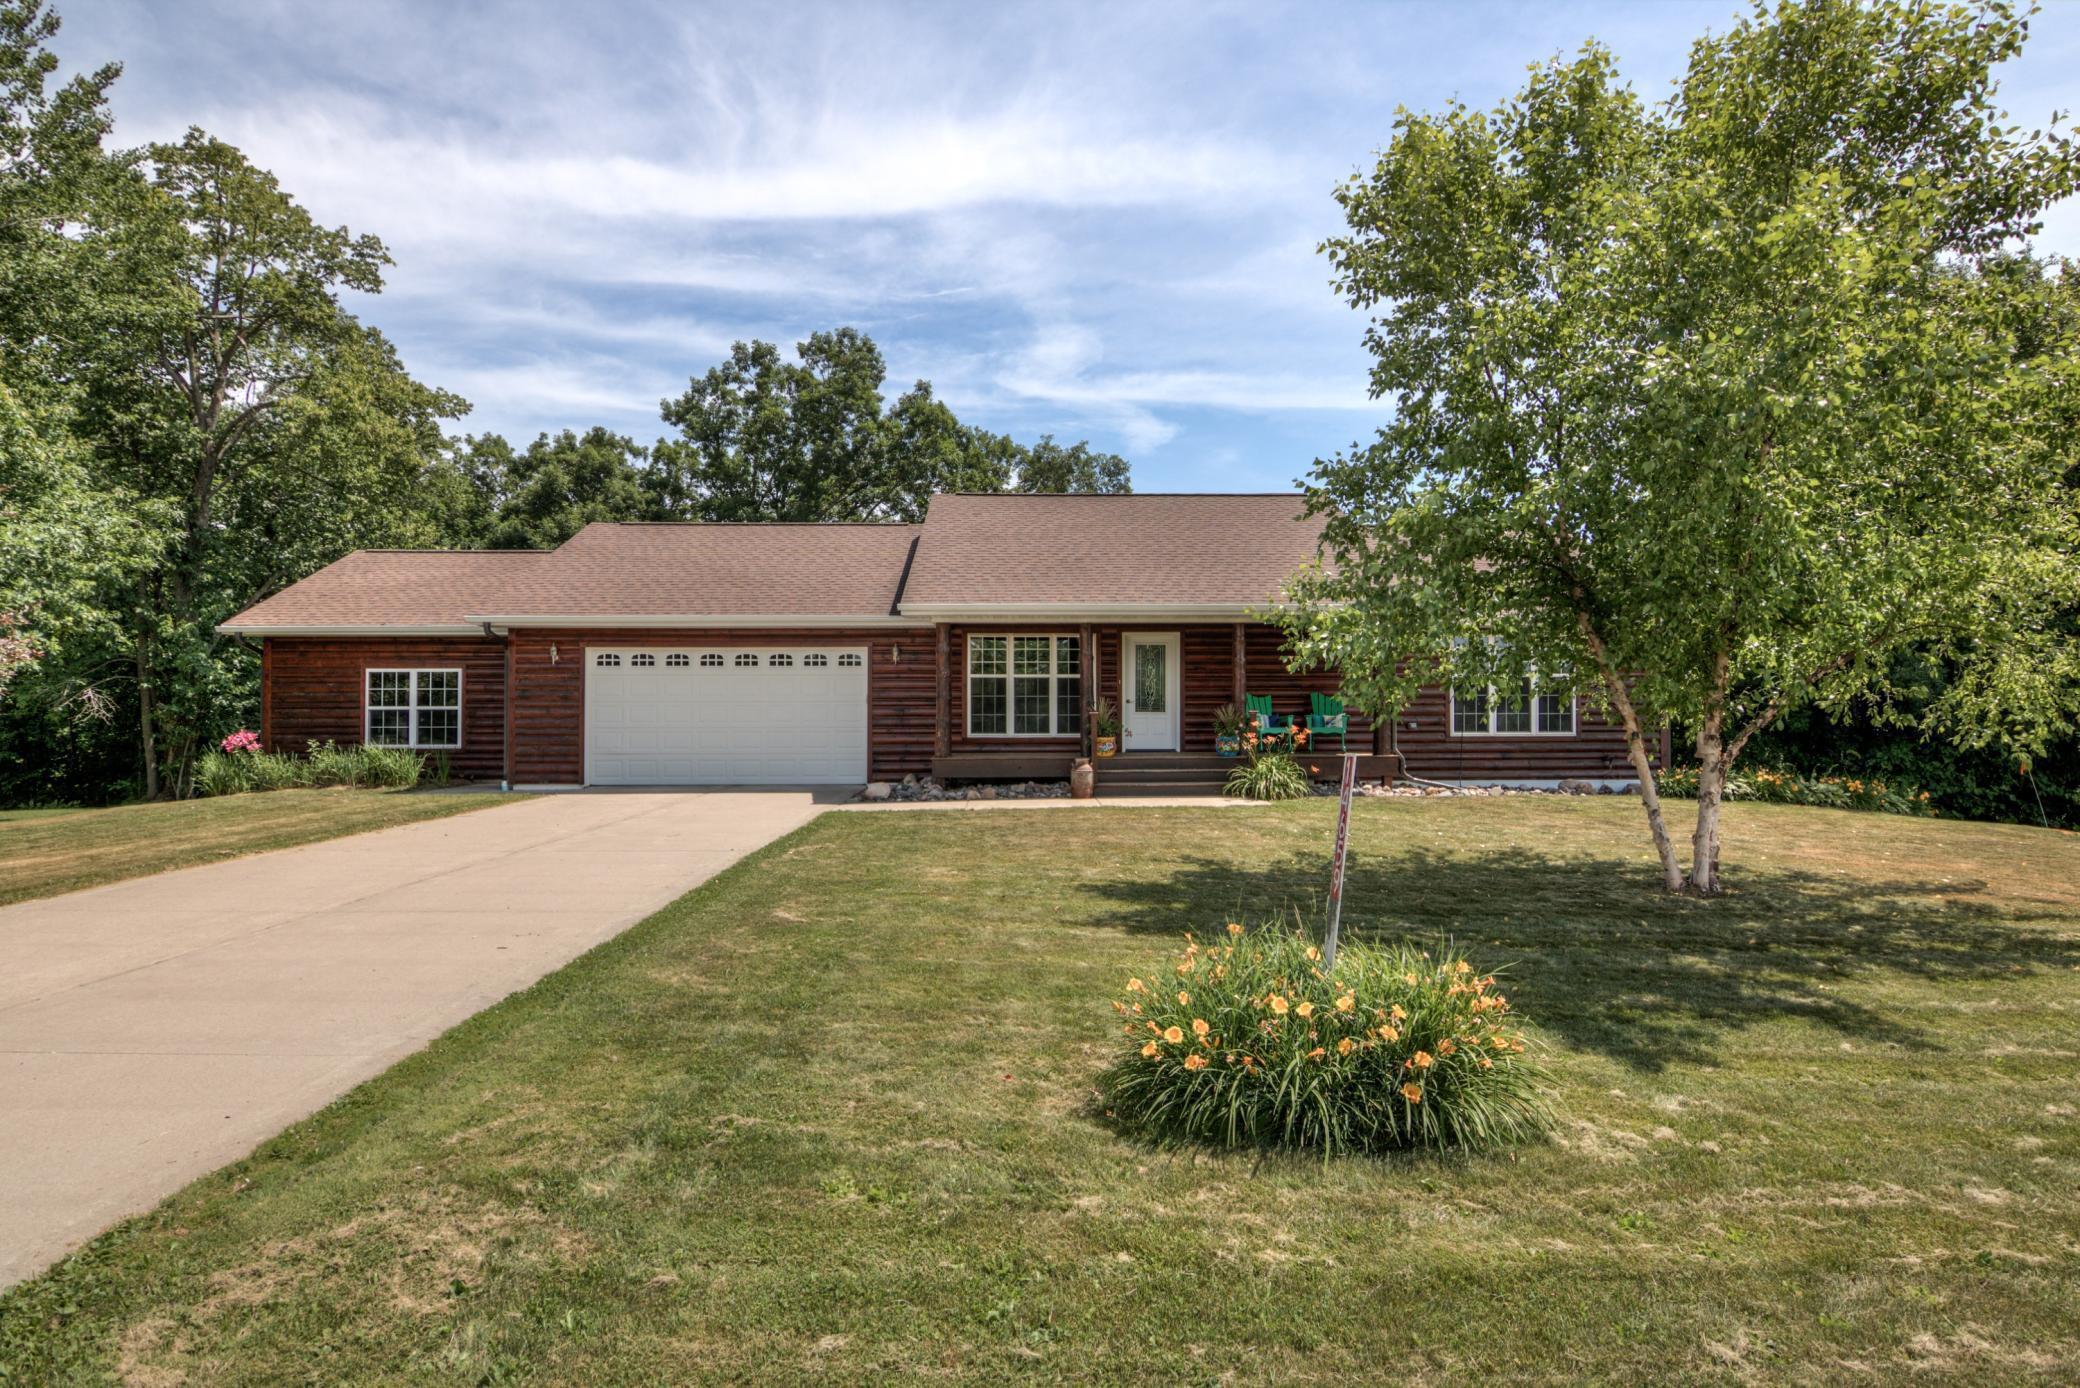 14659 187th Property Photo - Jim Falls, WI real estate listing